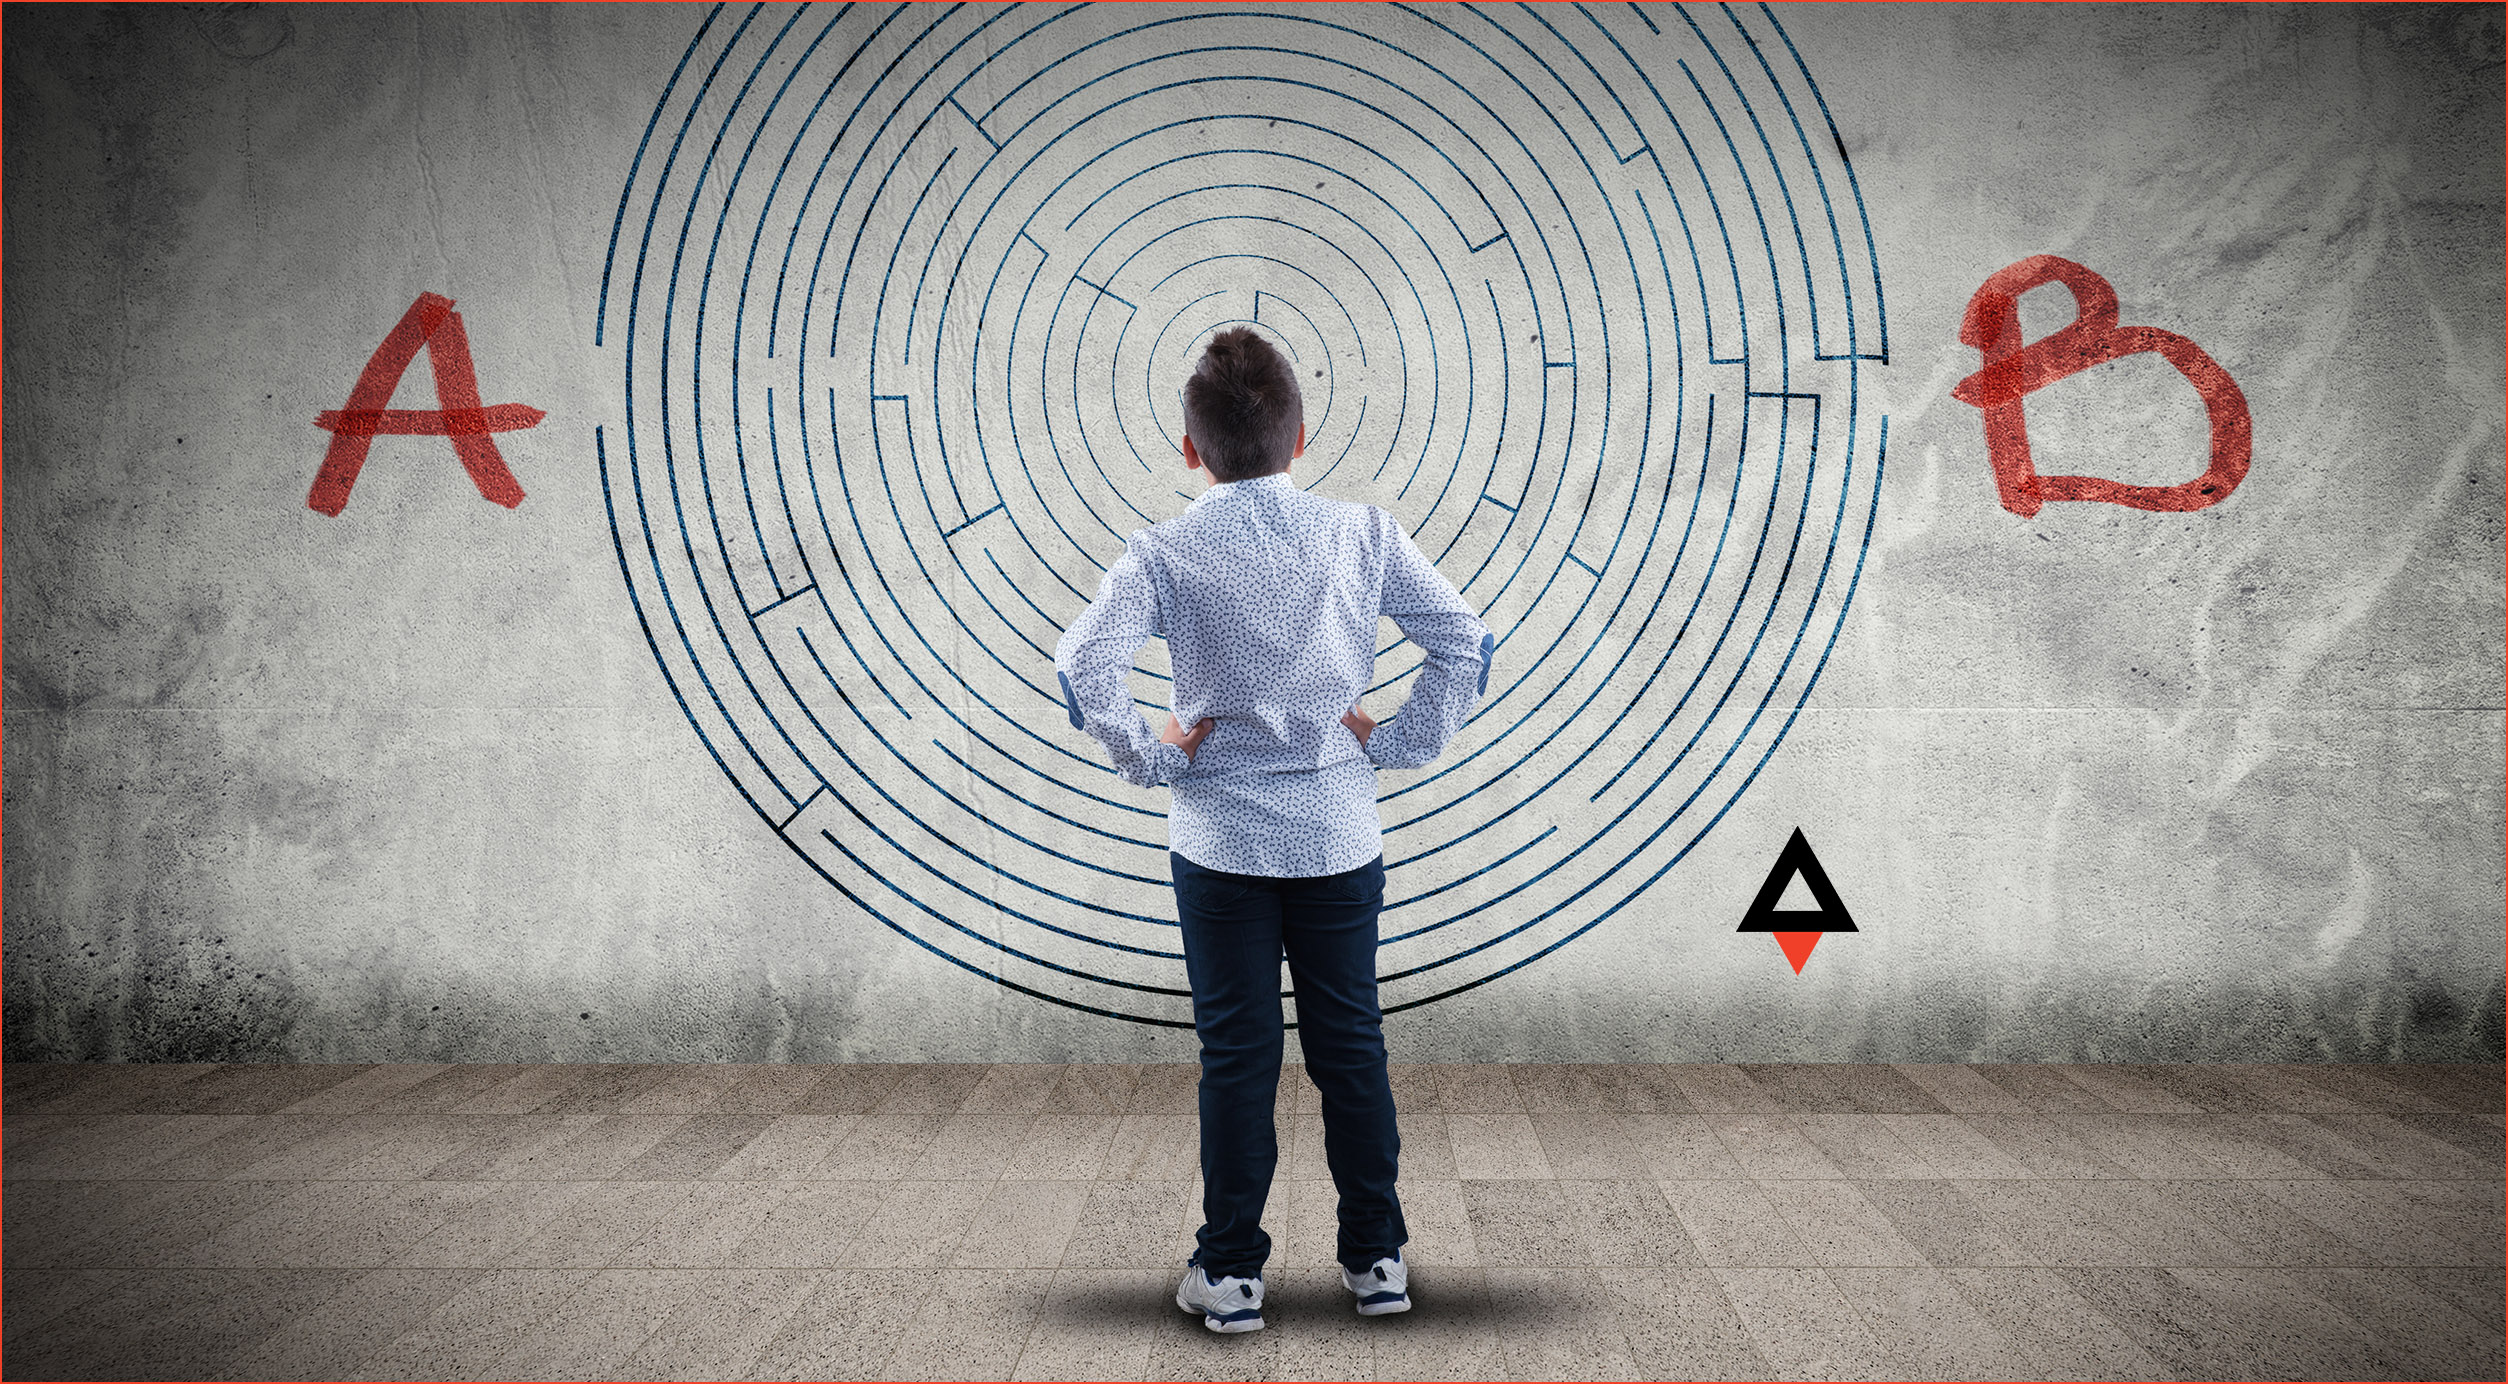 Clarifying strategic direction